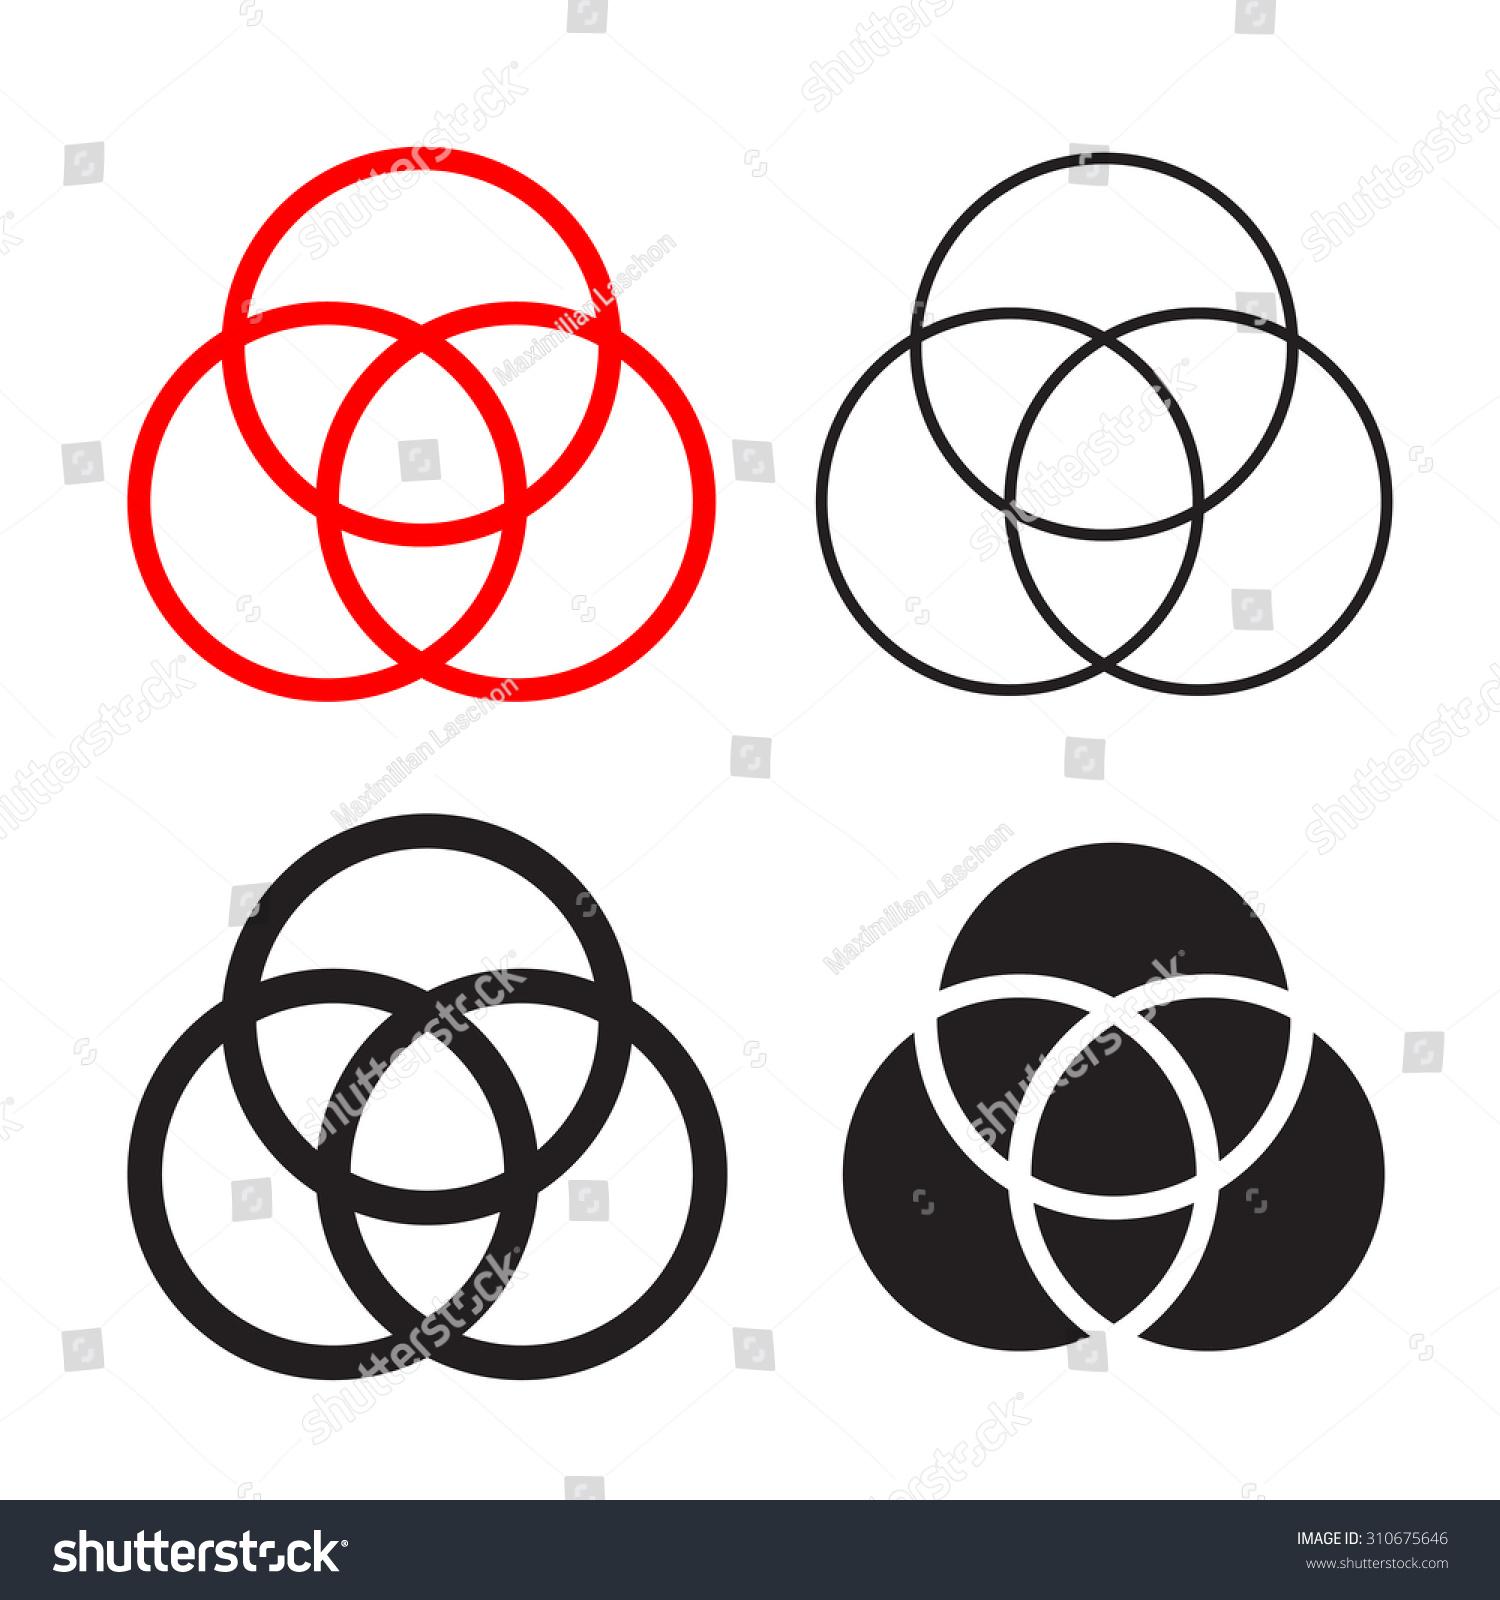 Catholic holy trinity symbols stock illustration 310675646 catholic holy trinity symbols biocorpaavc Image collections